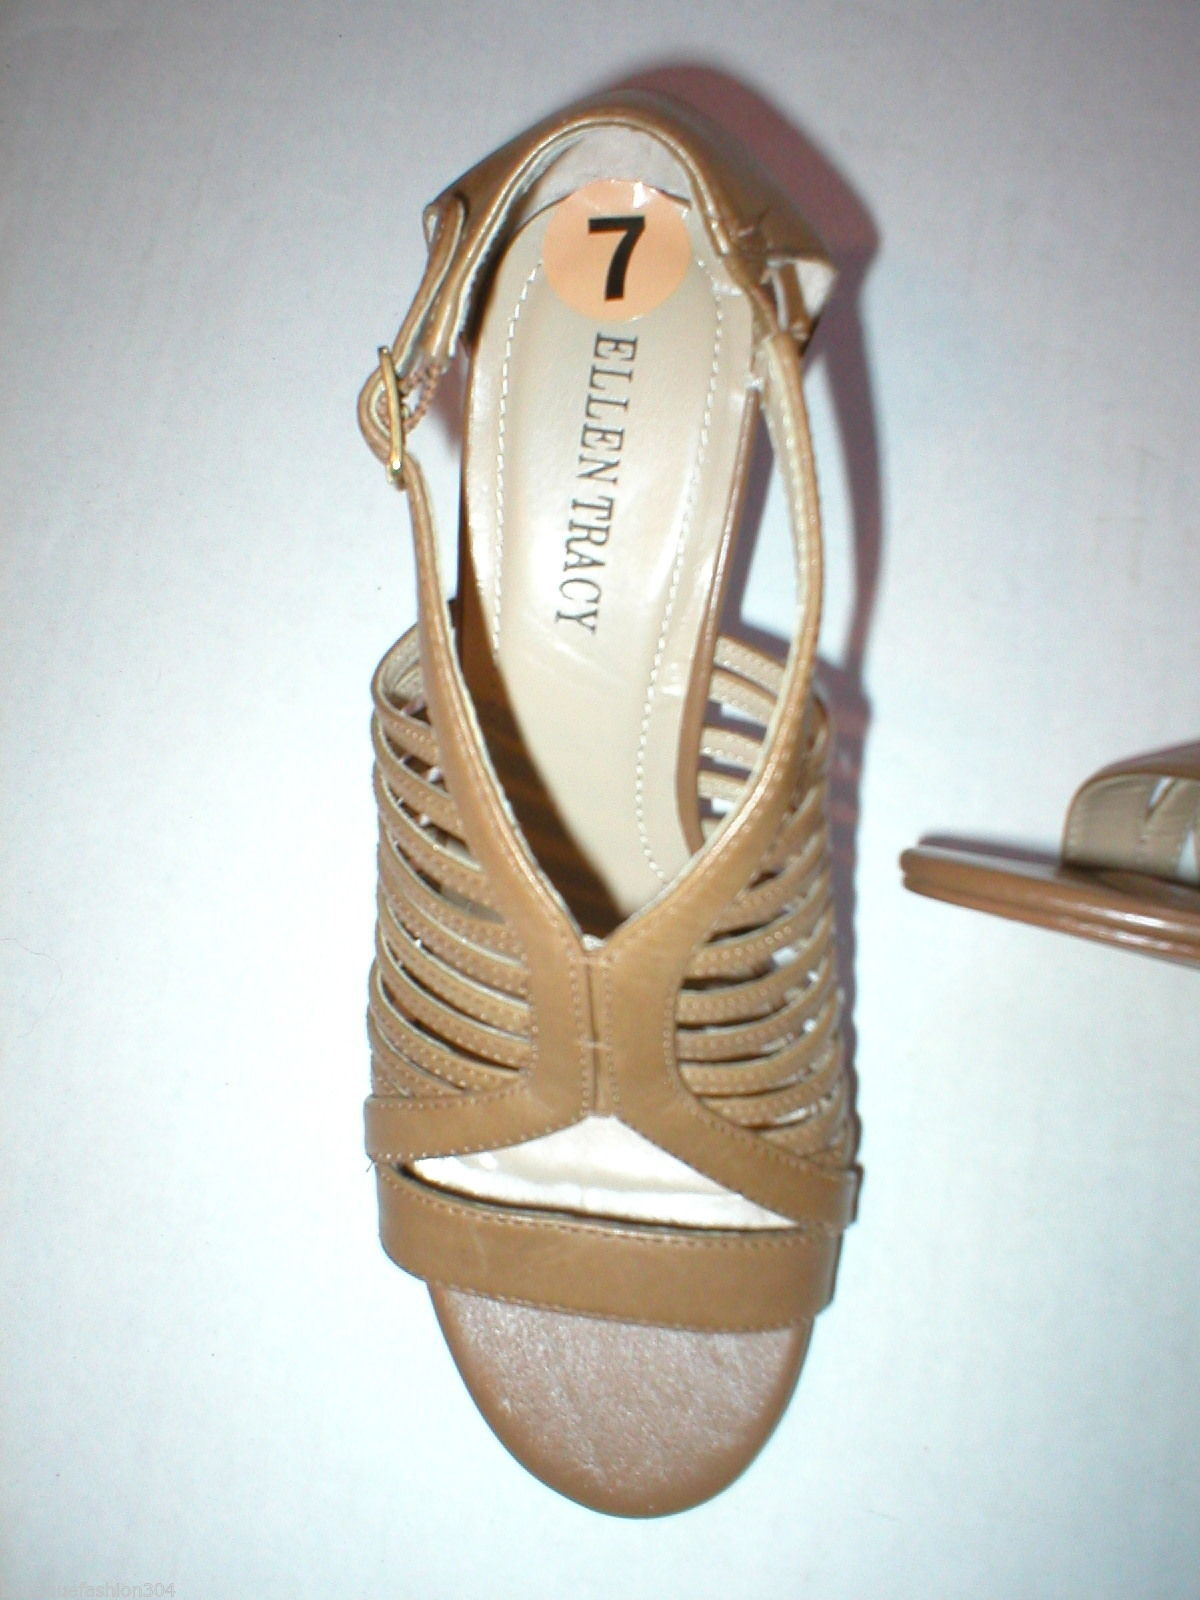 d191d0eb2ec6 ... New Ellen Tracy Sandal Heels Shoes Brown Leather 7 Open Straps Office  Date Play ...